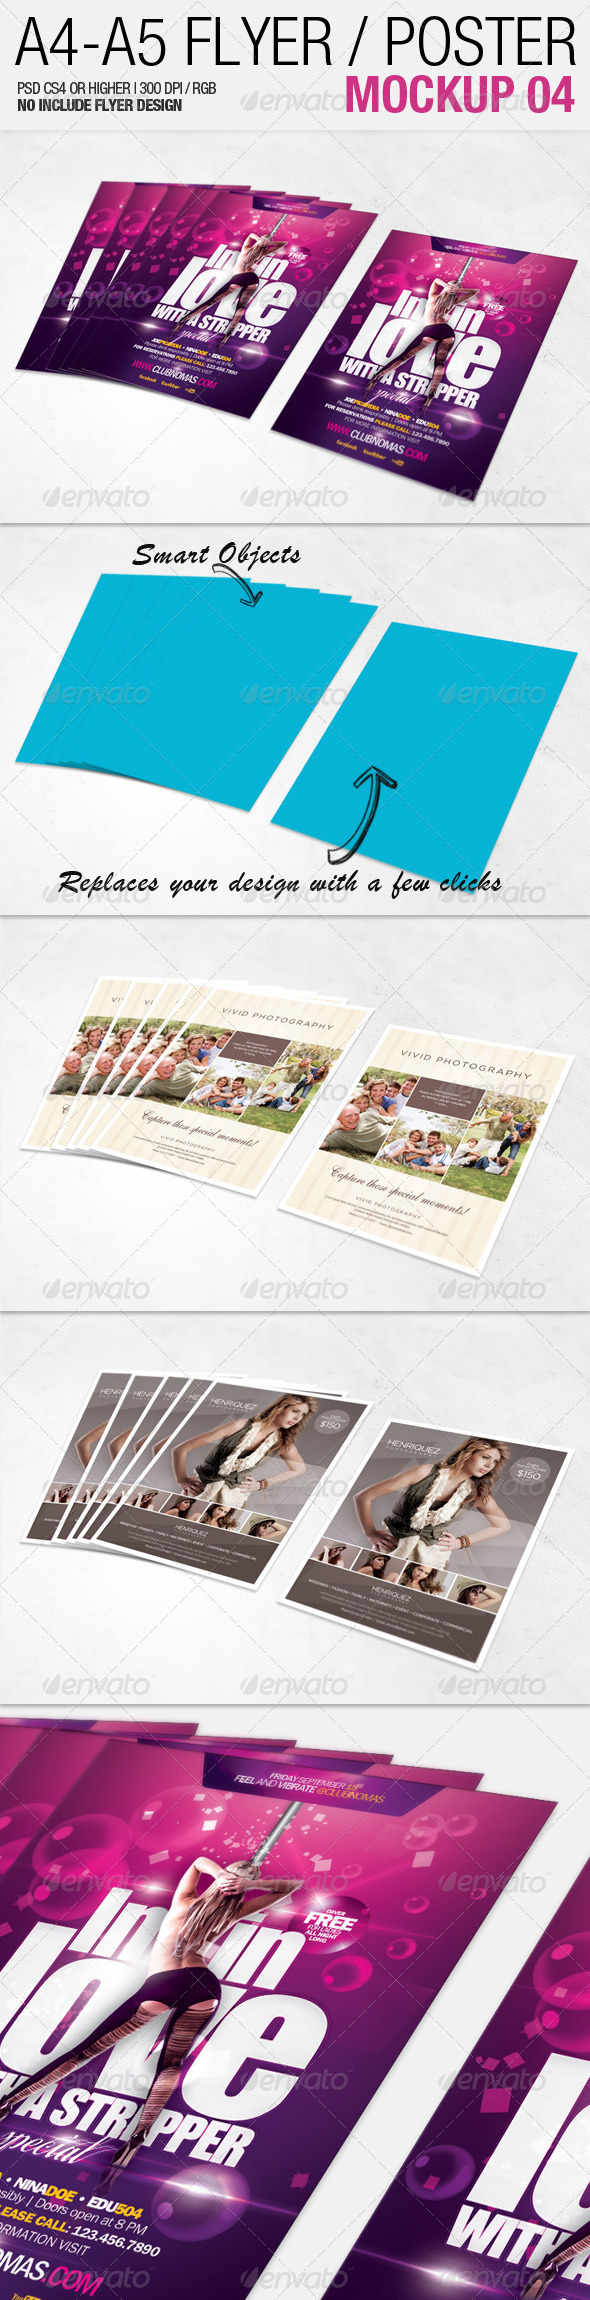 GraphicRiver A4 A5 Flyer Mockup 04 2557645